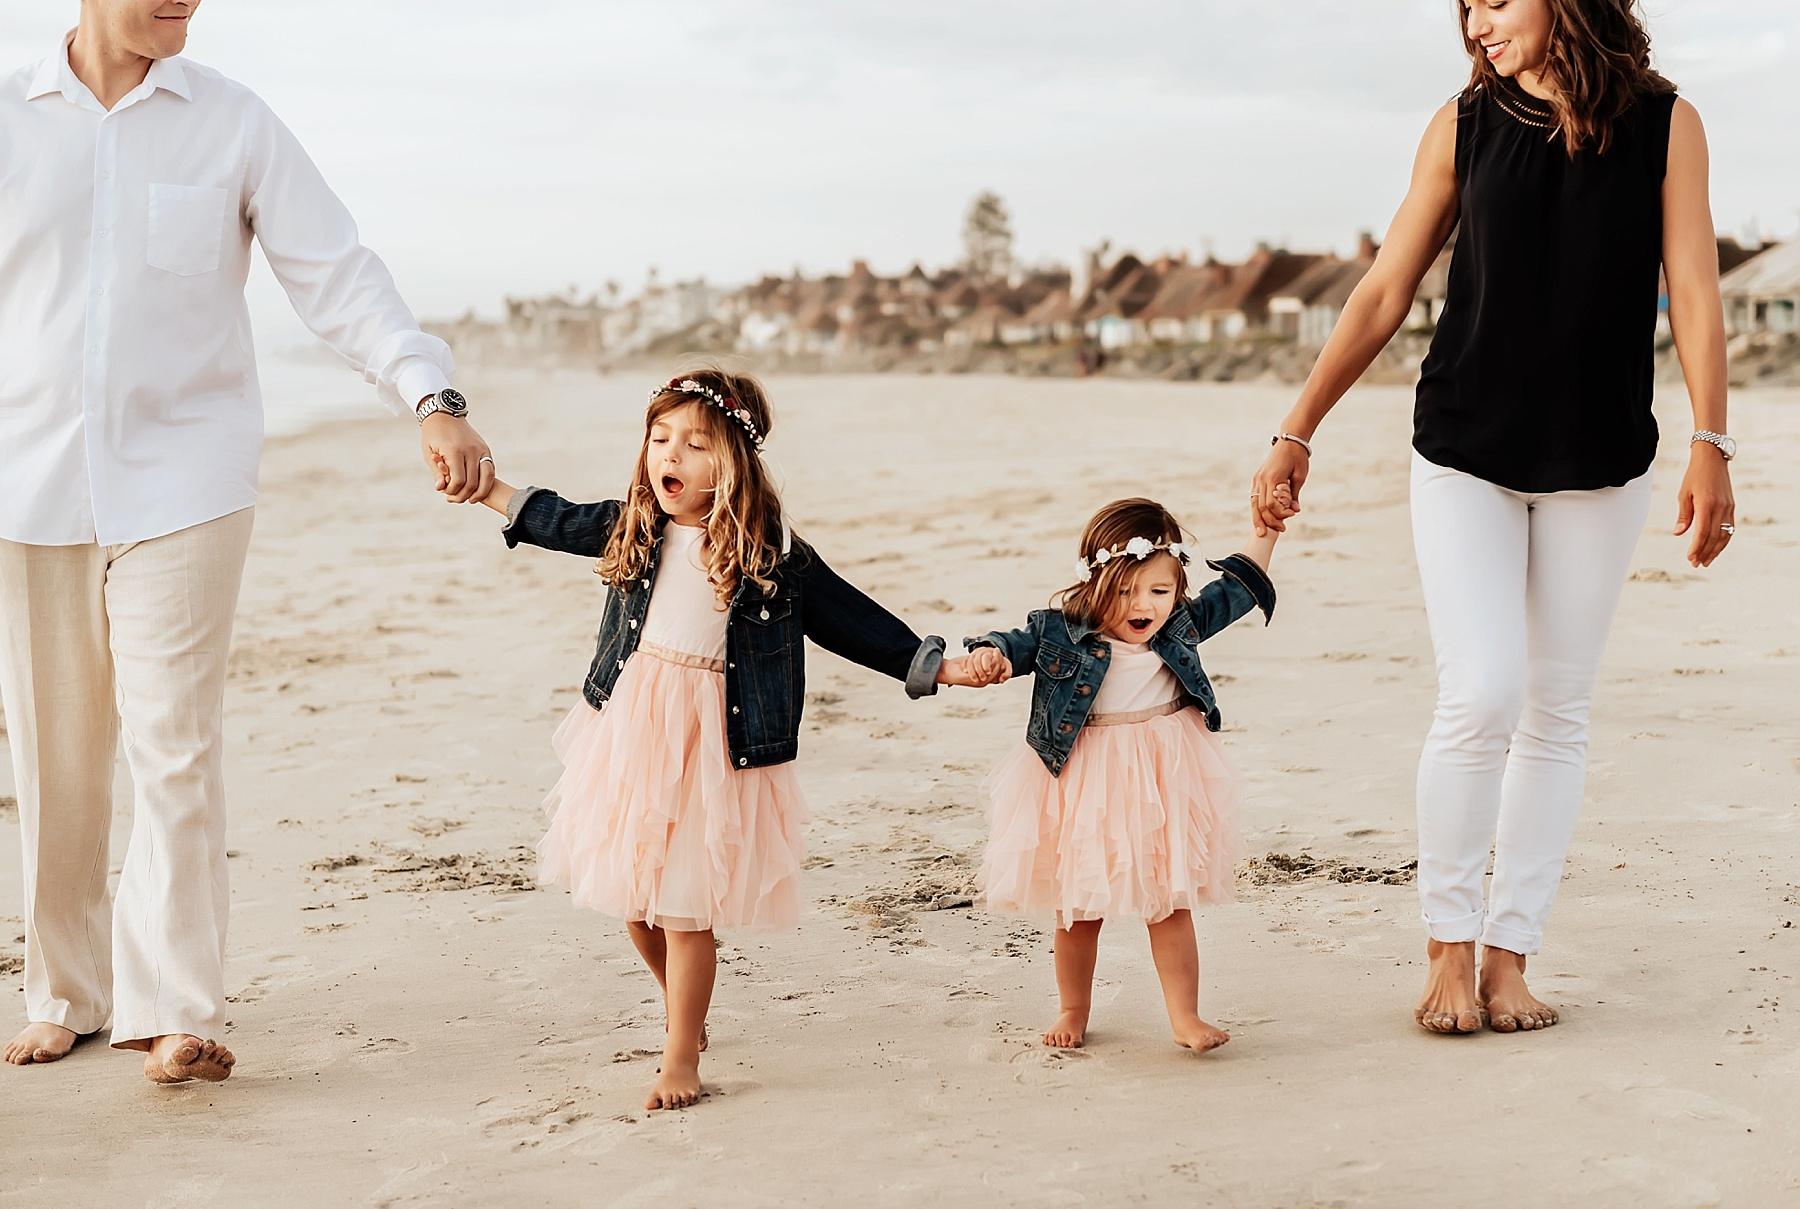 family beach portrait photography family of 4 walking on beach